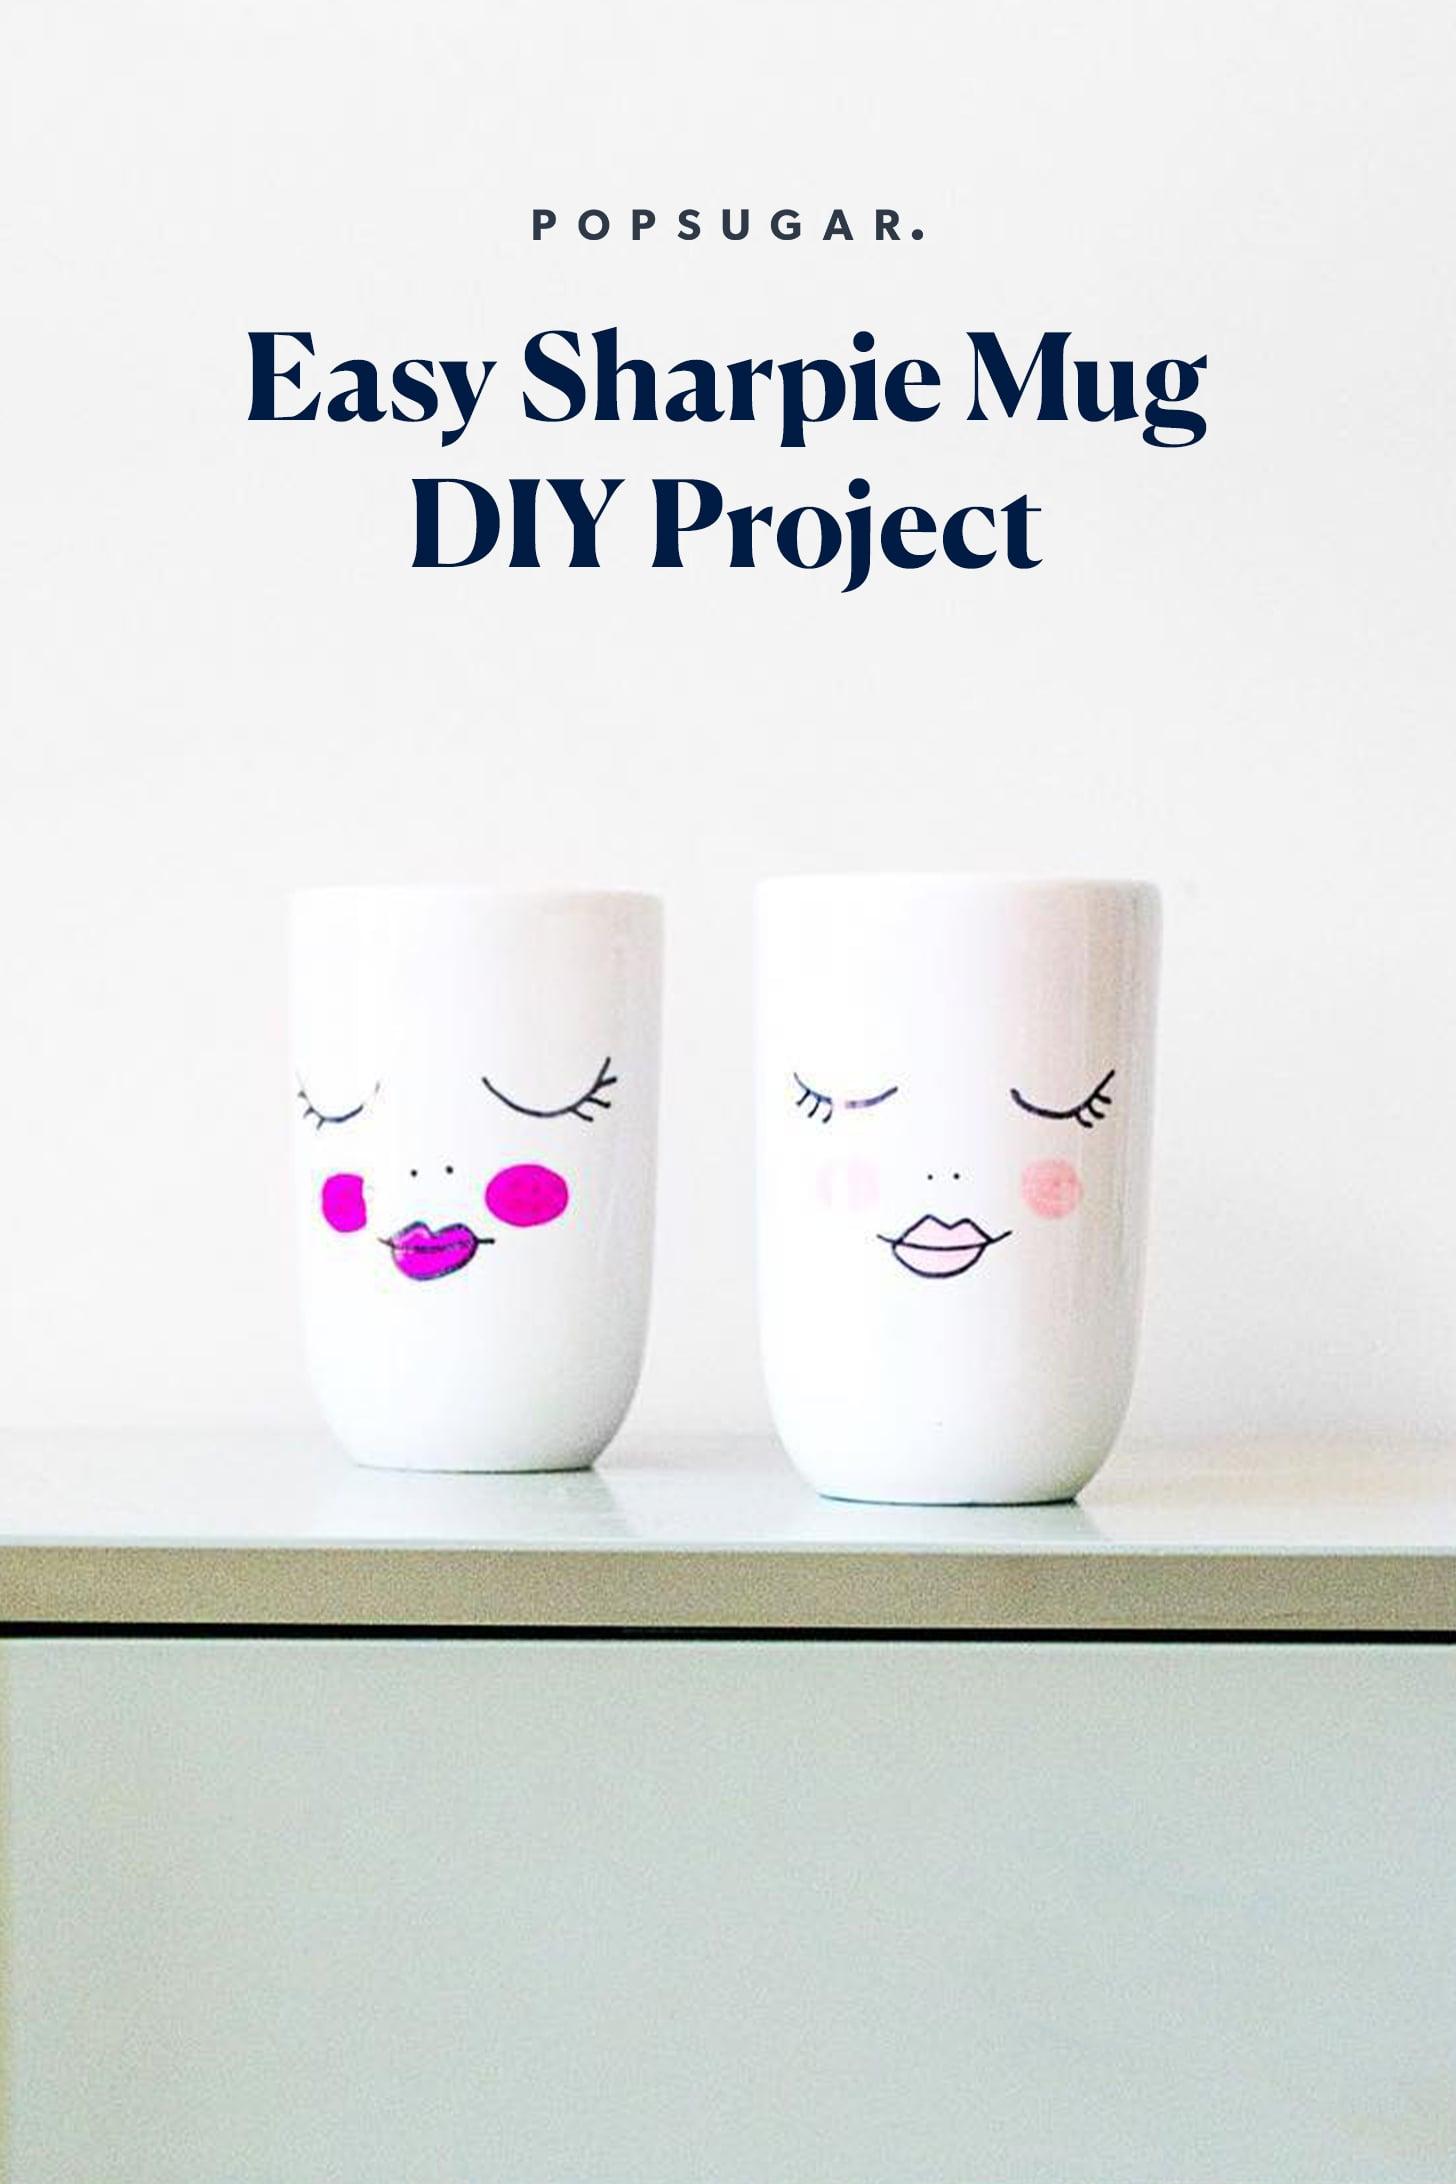 Easy Sharpie Mug Diy Project Popsugar Smart Living